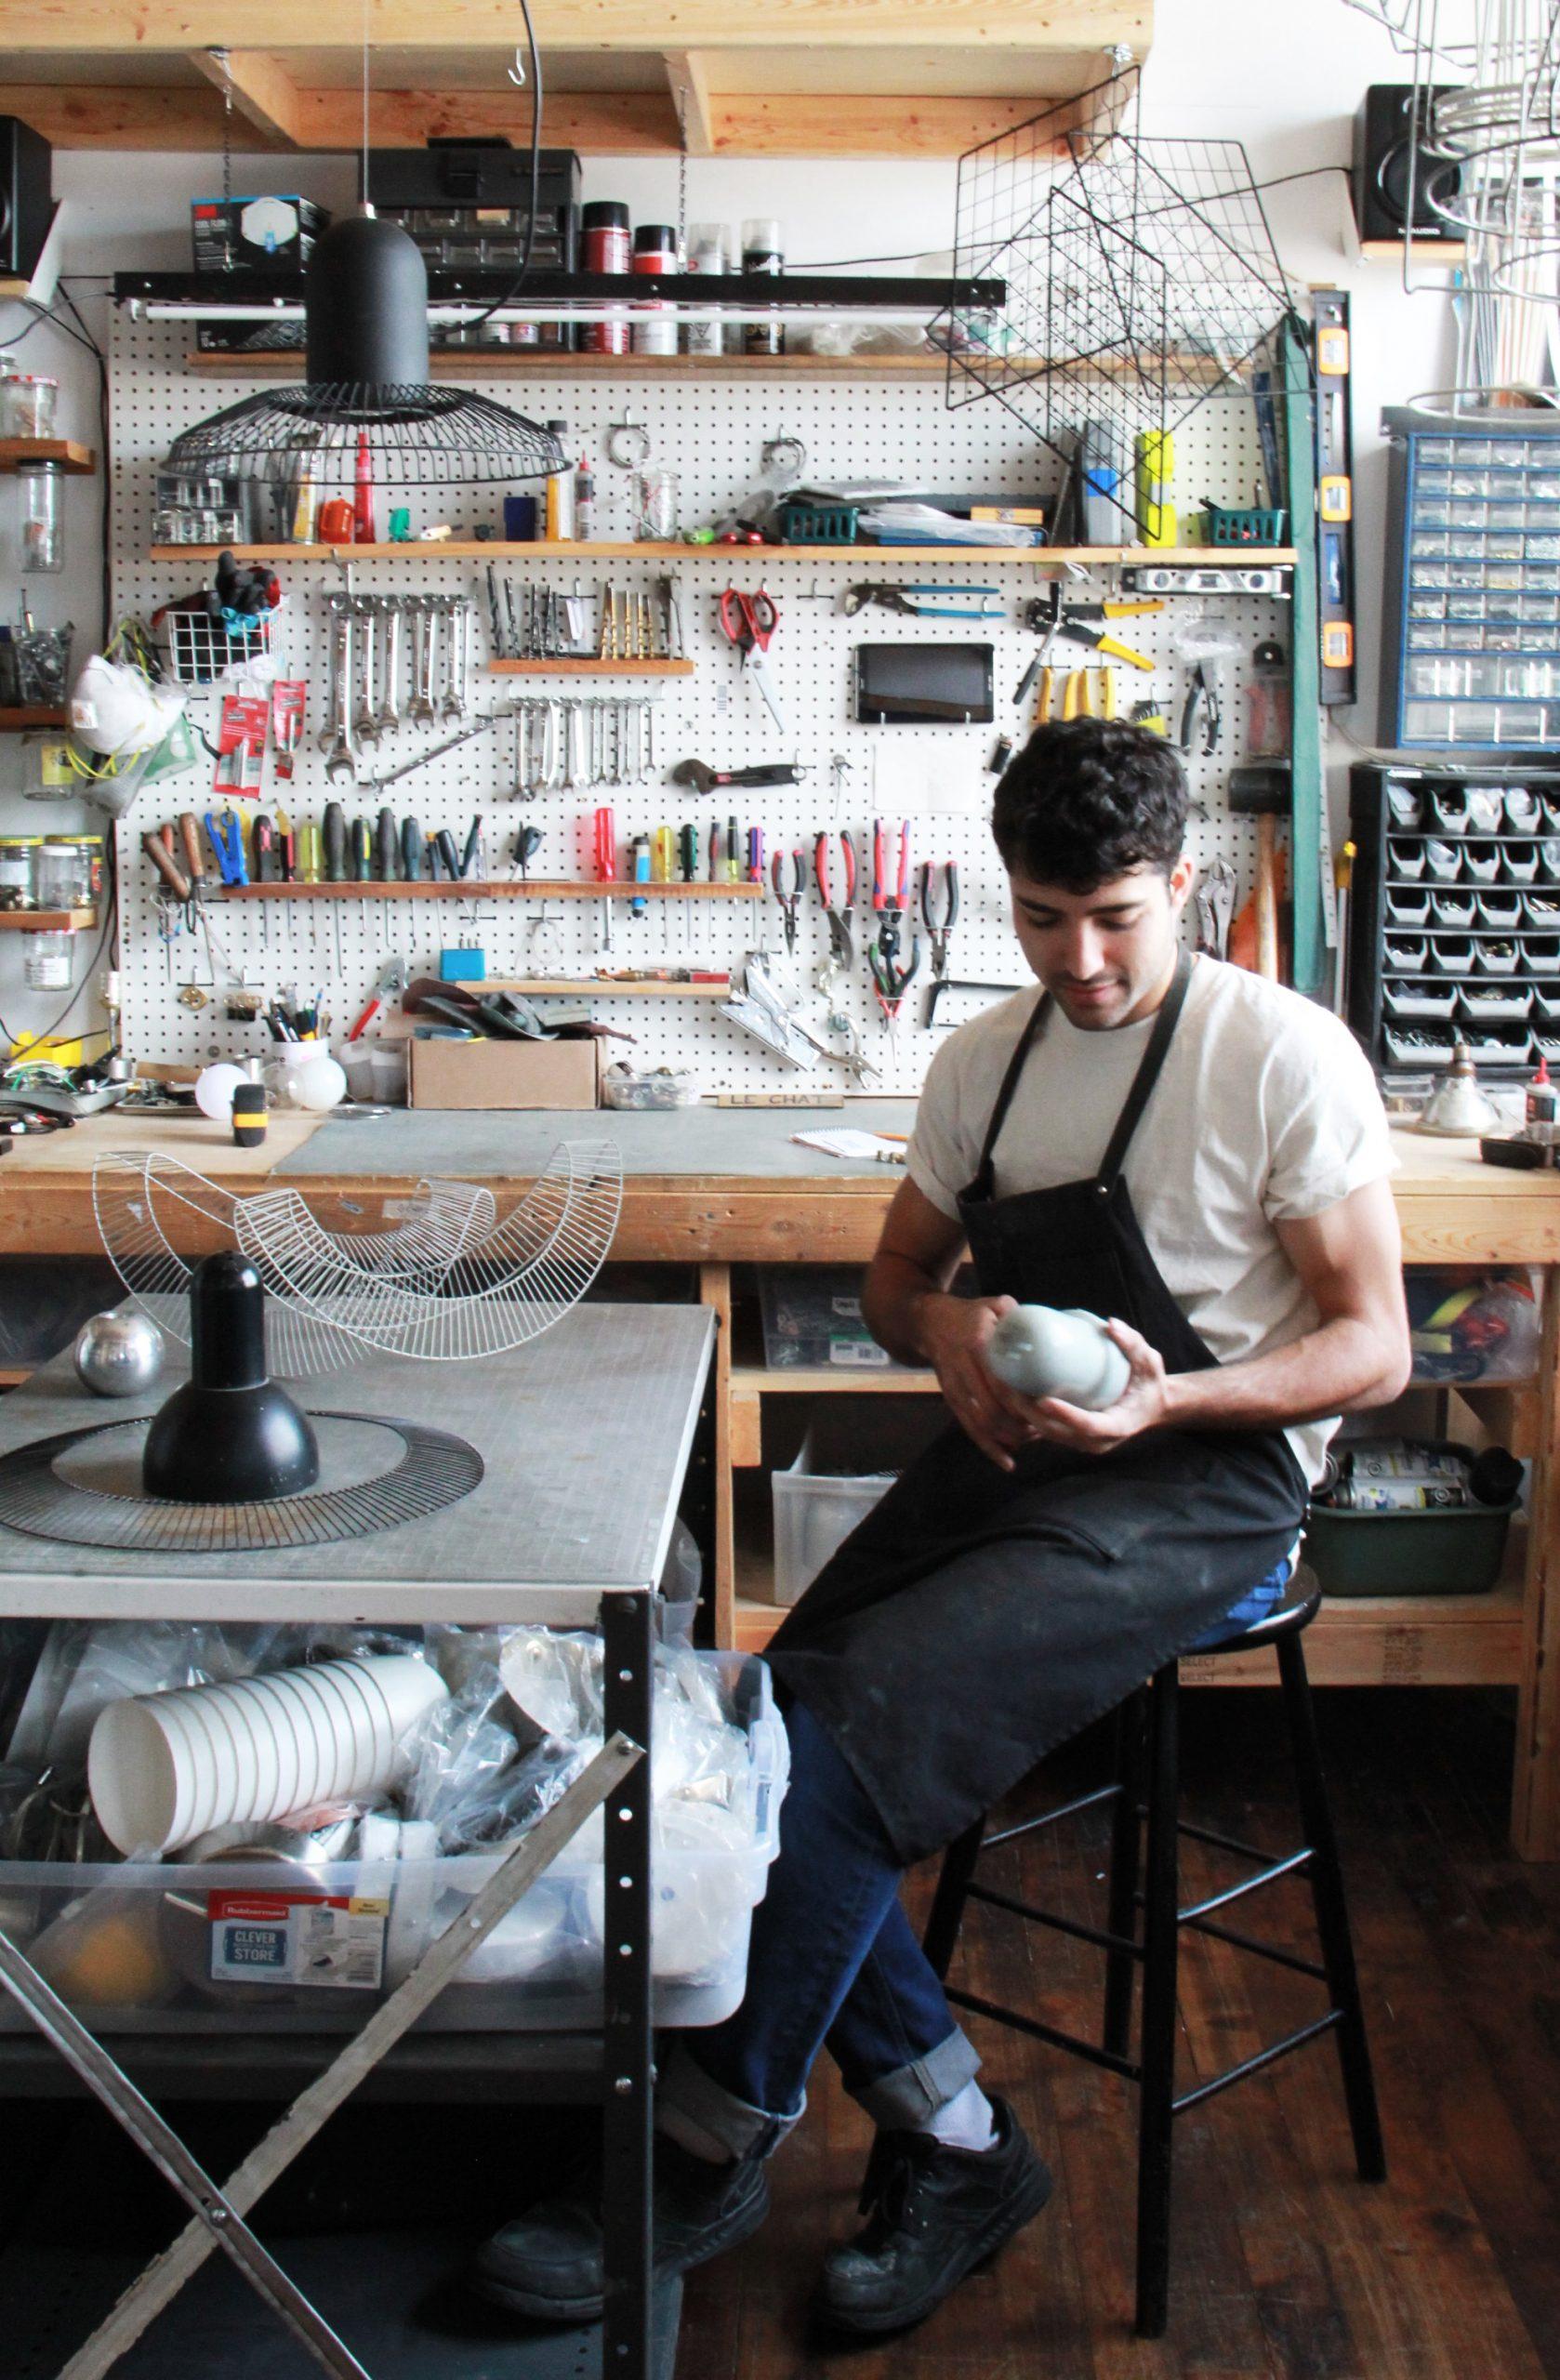 studio botte founder Philippe Charlebois Gomez